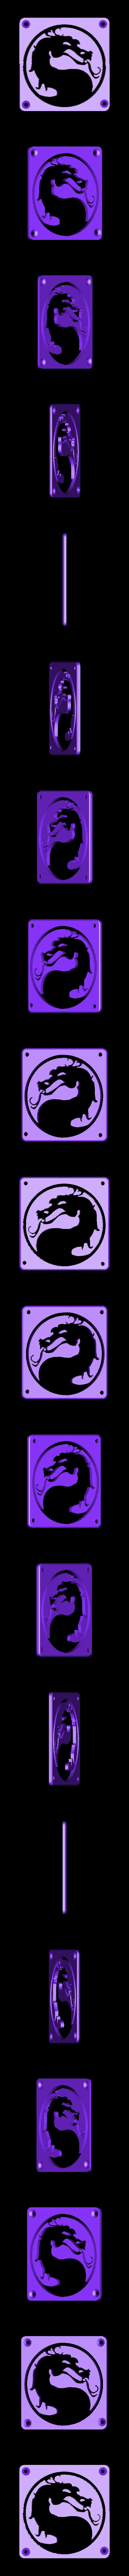 MortalCombat_Plate.STL Download free STL file Mortal Kombat LED Light/NightLight • Object to 3D print, Balkhagal4D